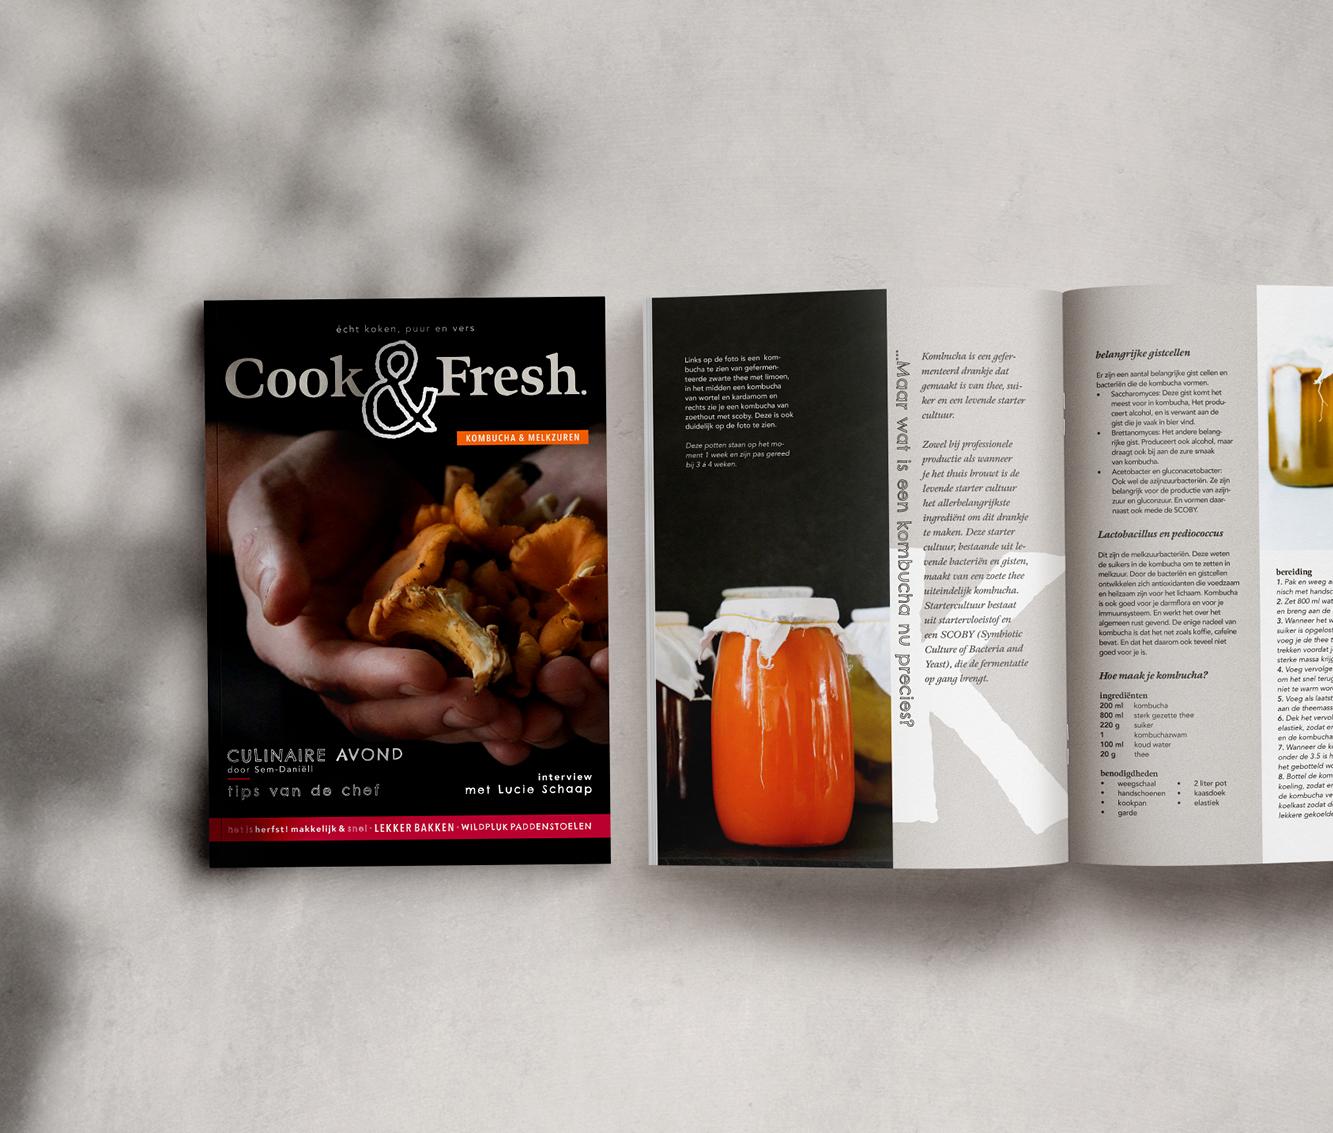 Studio Marly - Creative Agency - Cook & Fresh